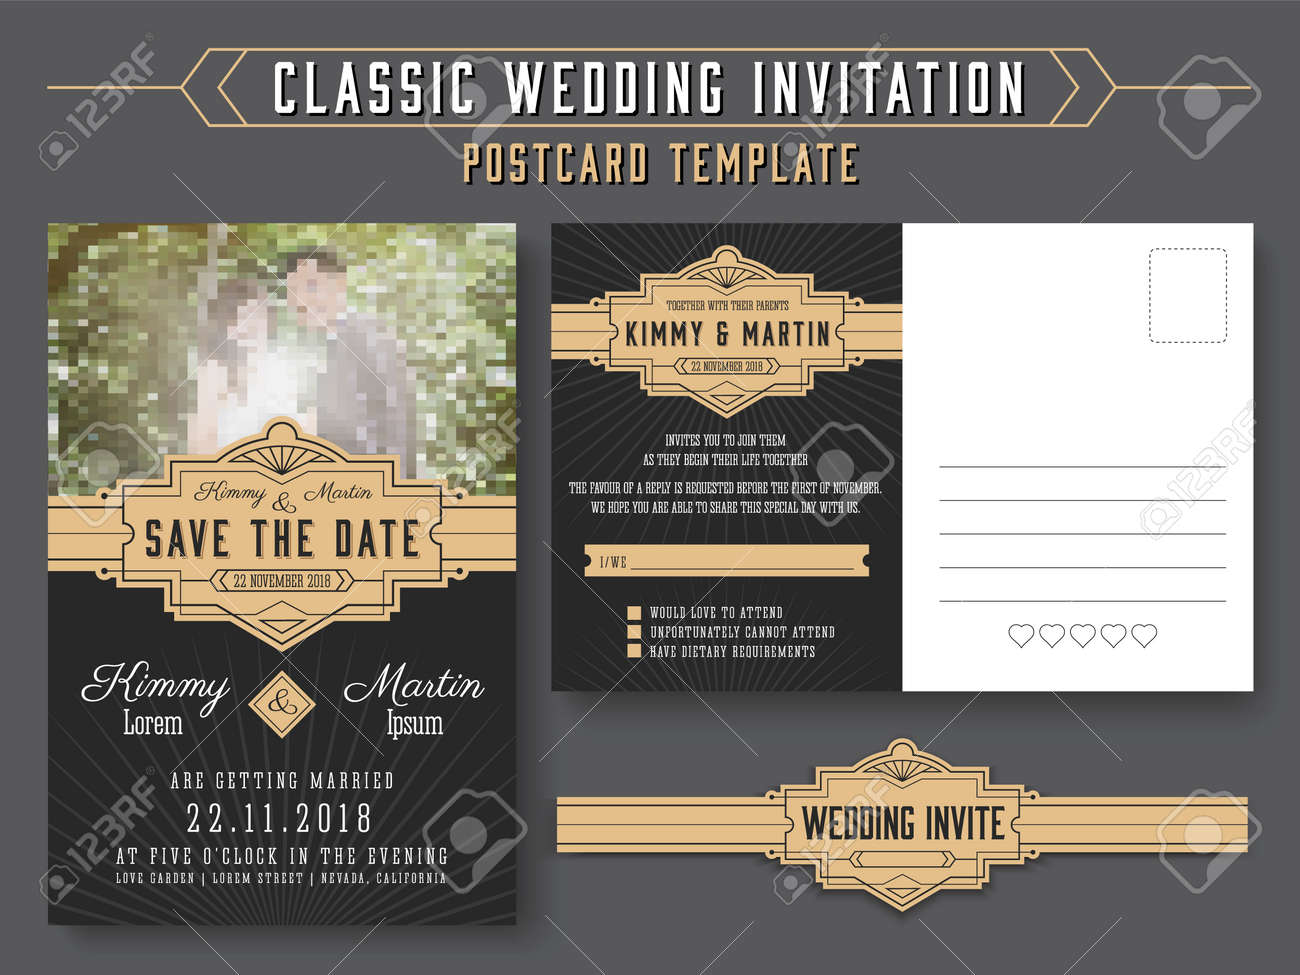 Classic Vintage Wedding Invitation Card Design, Suitable For ...